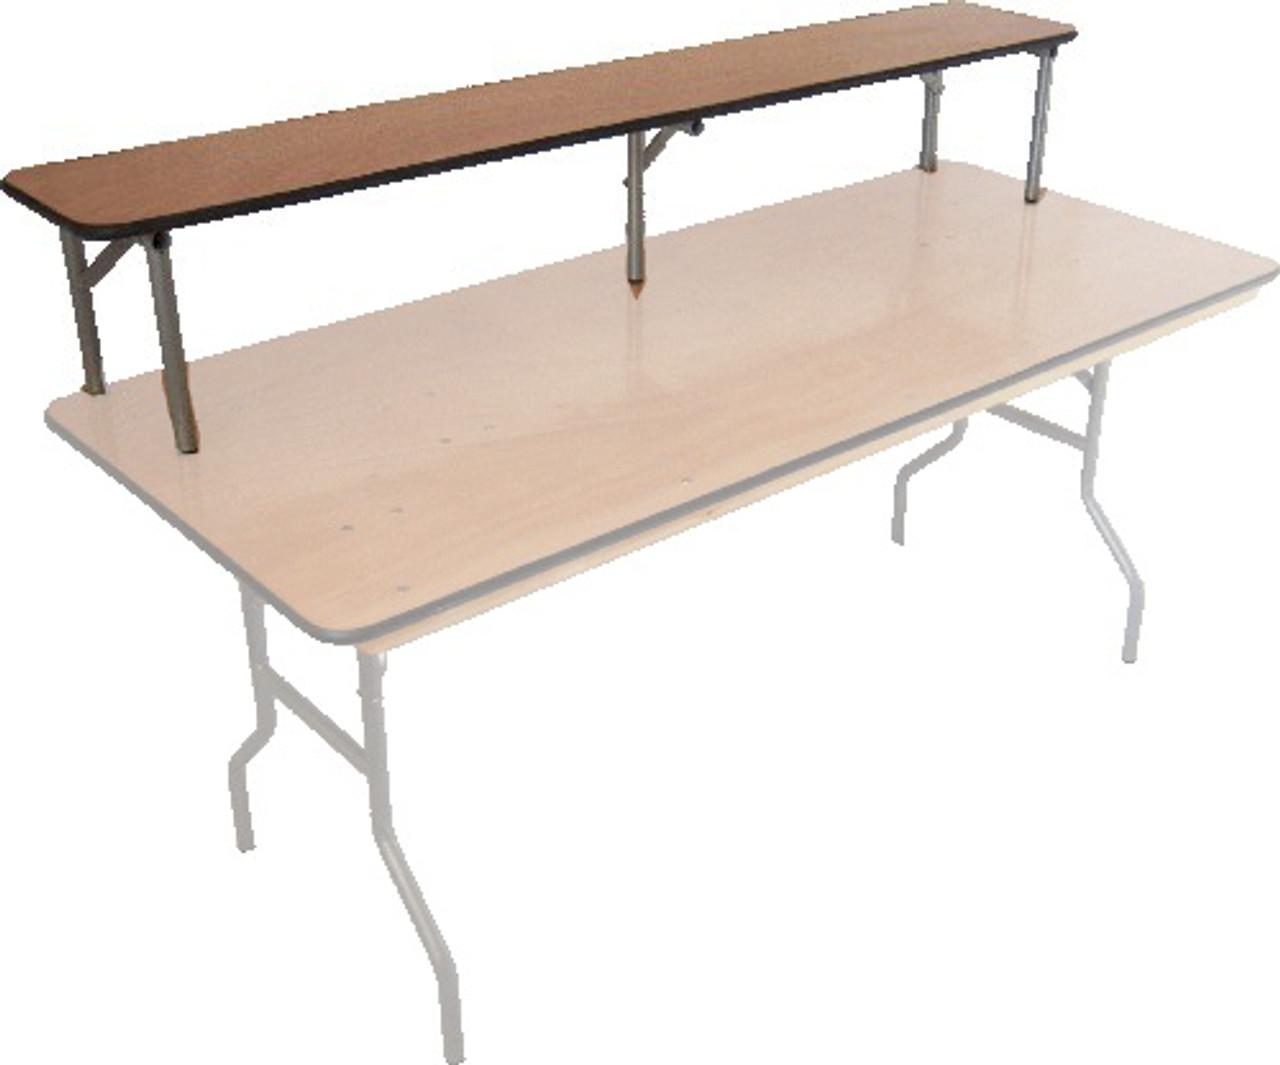 Excellent Luan 12W X 72L 6Ft Straight Portable Bar Top Riser Machost Co Dining Chair Design Ideas Machostcouk